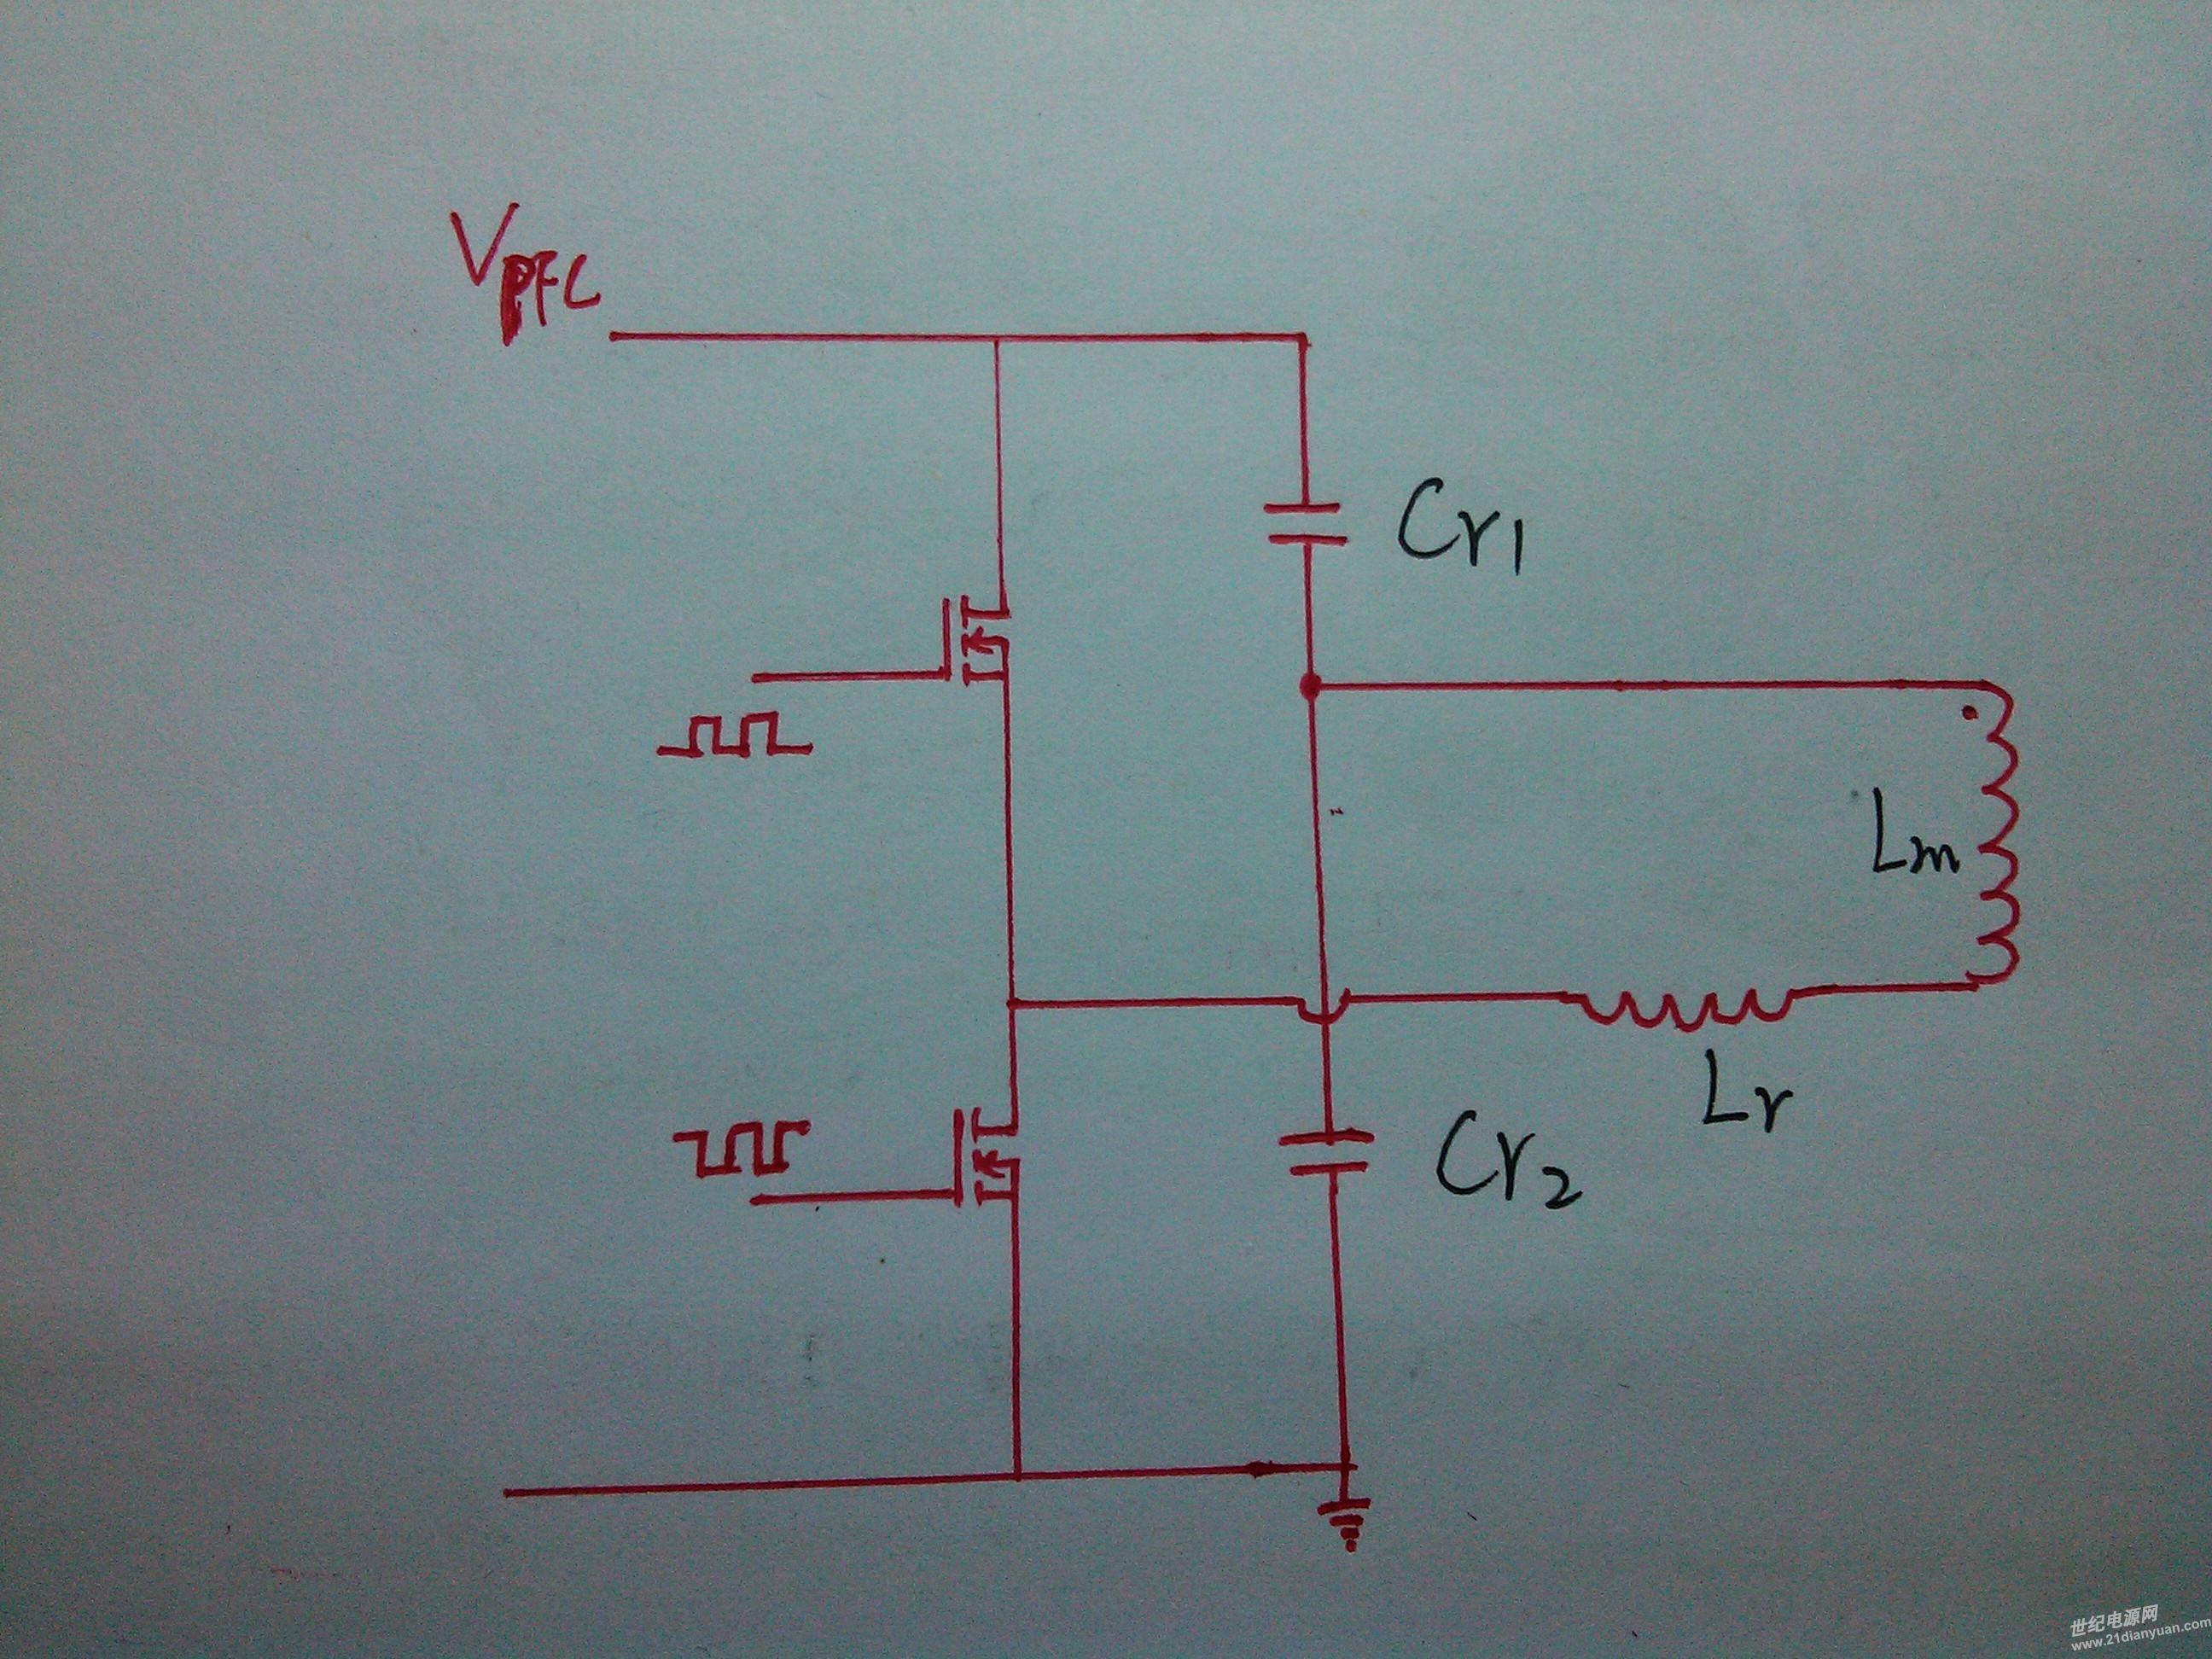 llc电路适合做